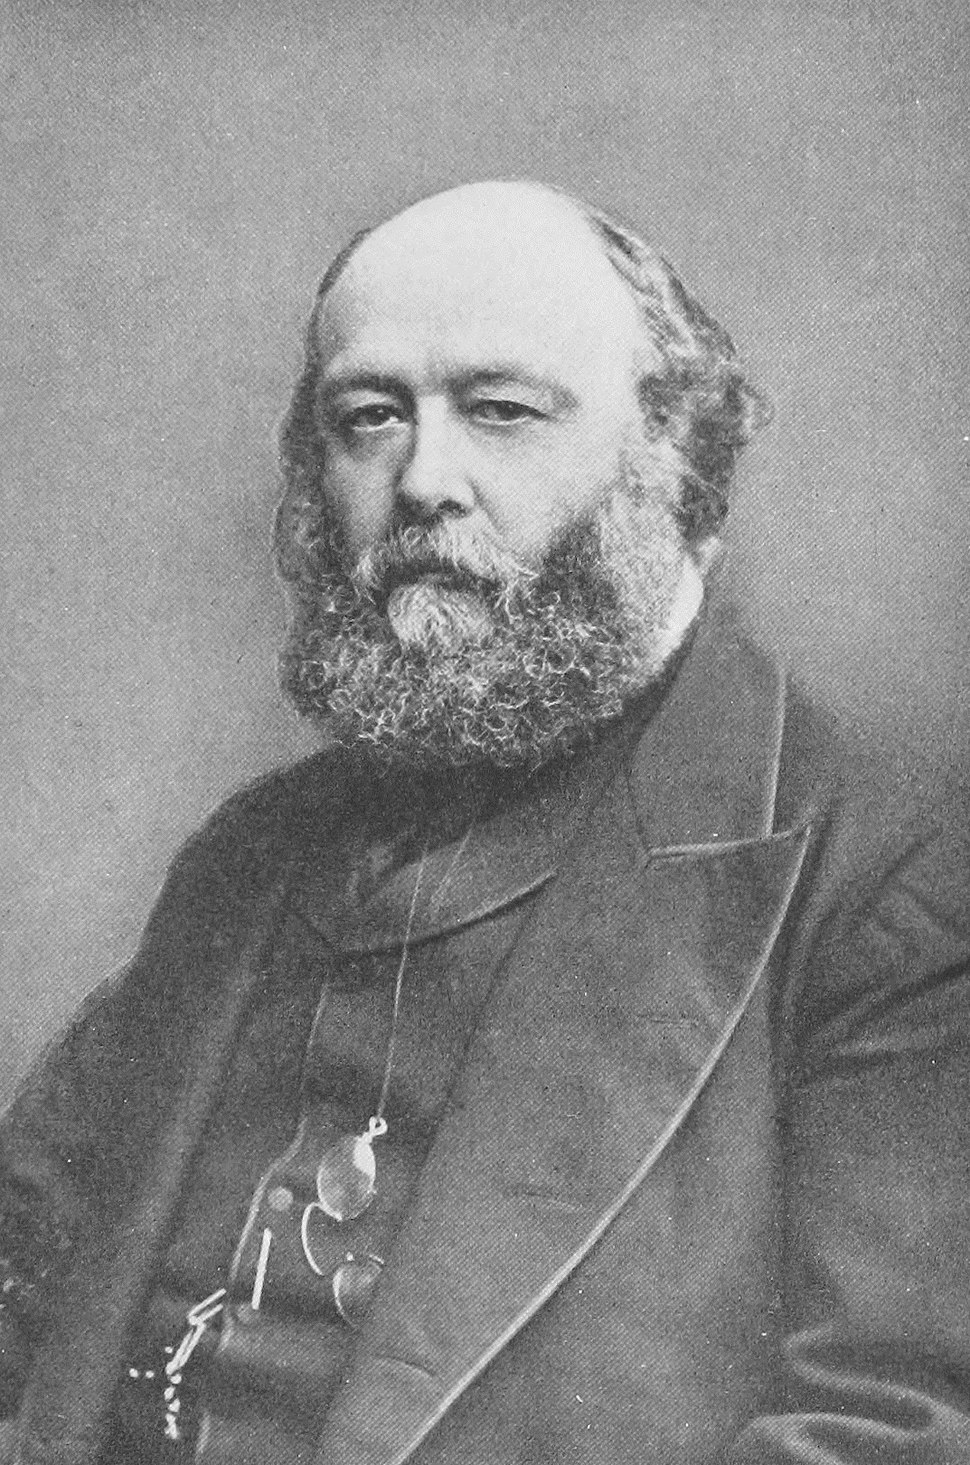 Photo of Robert Gascoyne-Cecil, 3rd Marquess of Salisbury